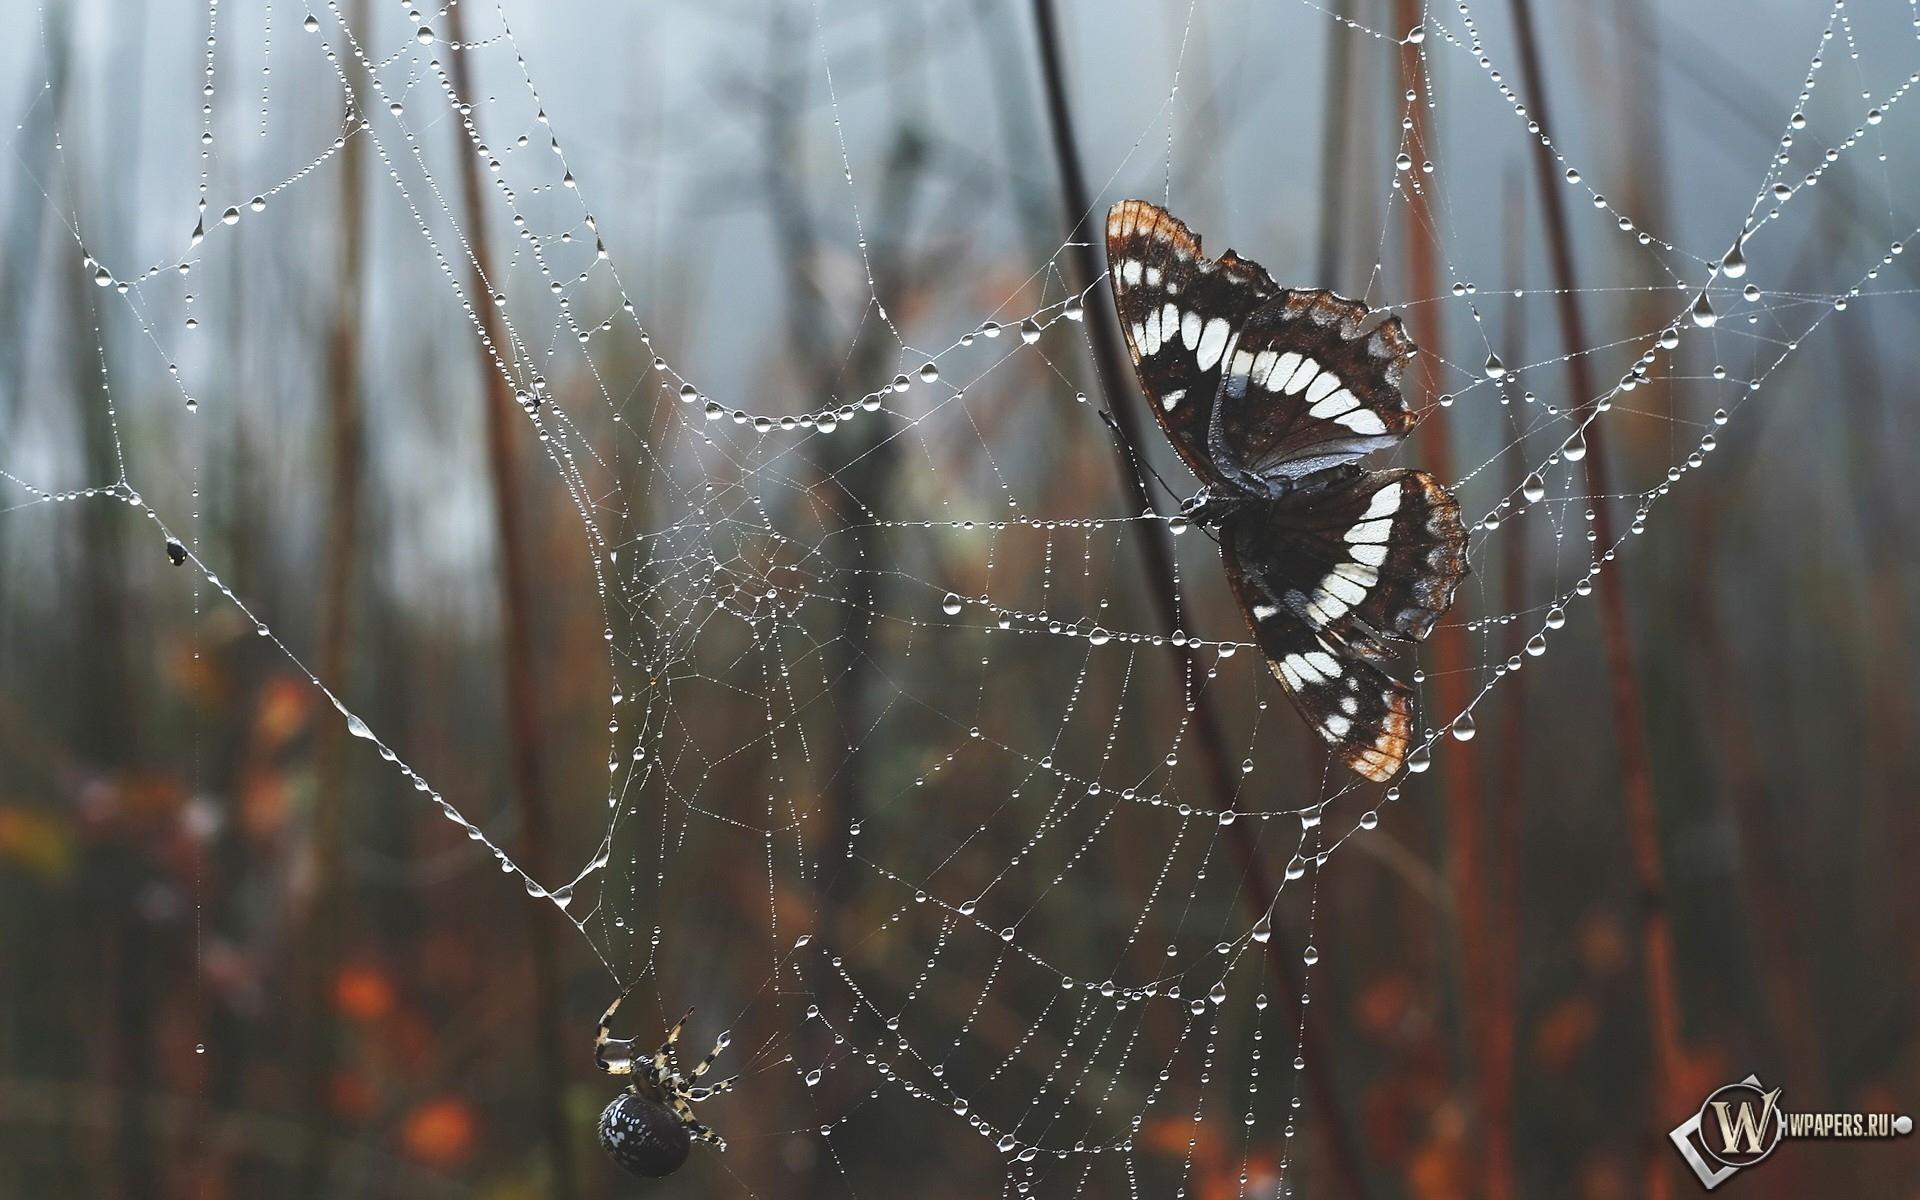 Бабочка в паутине 1920x1200